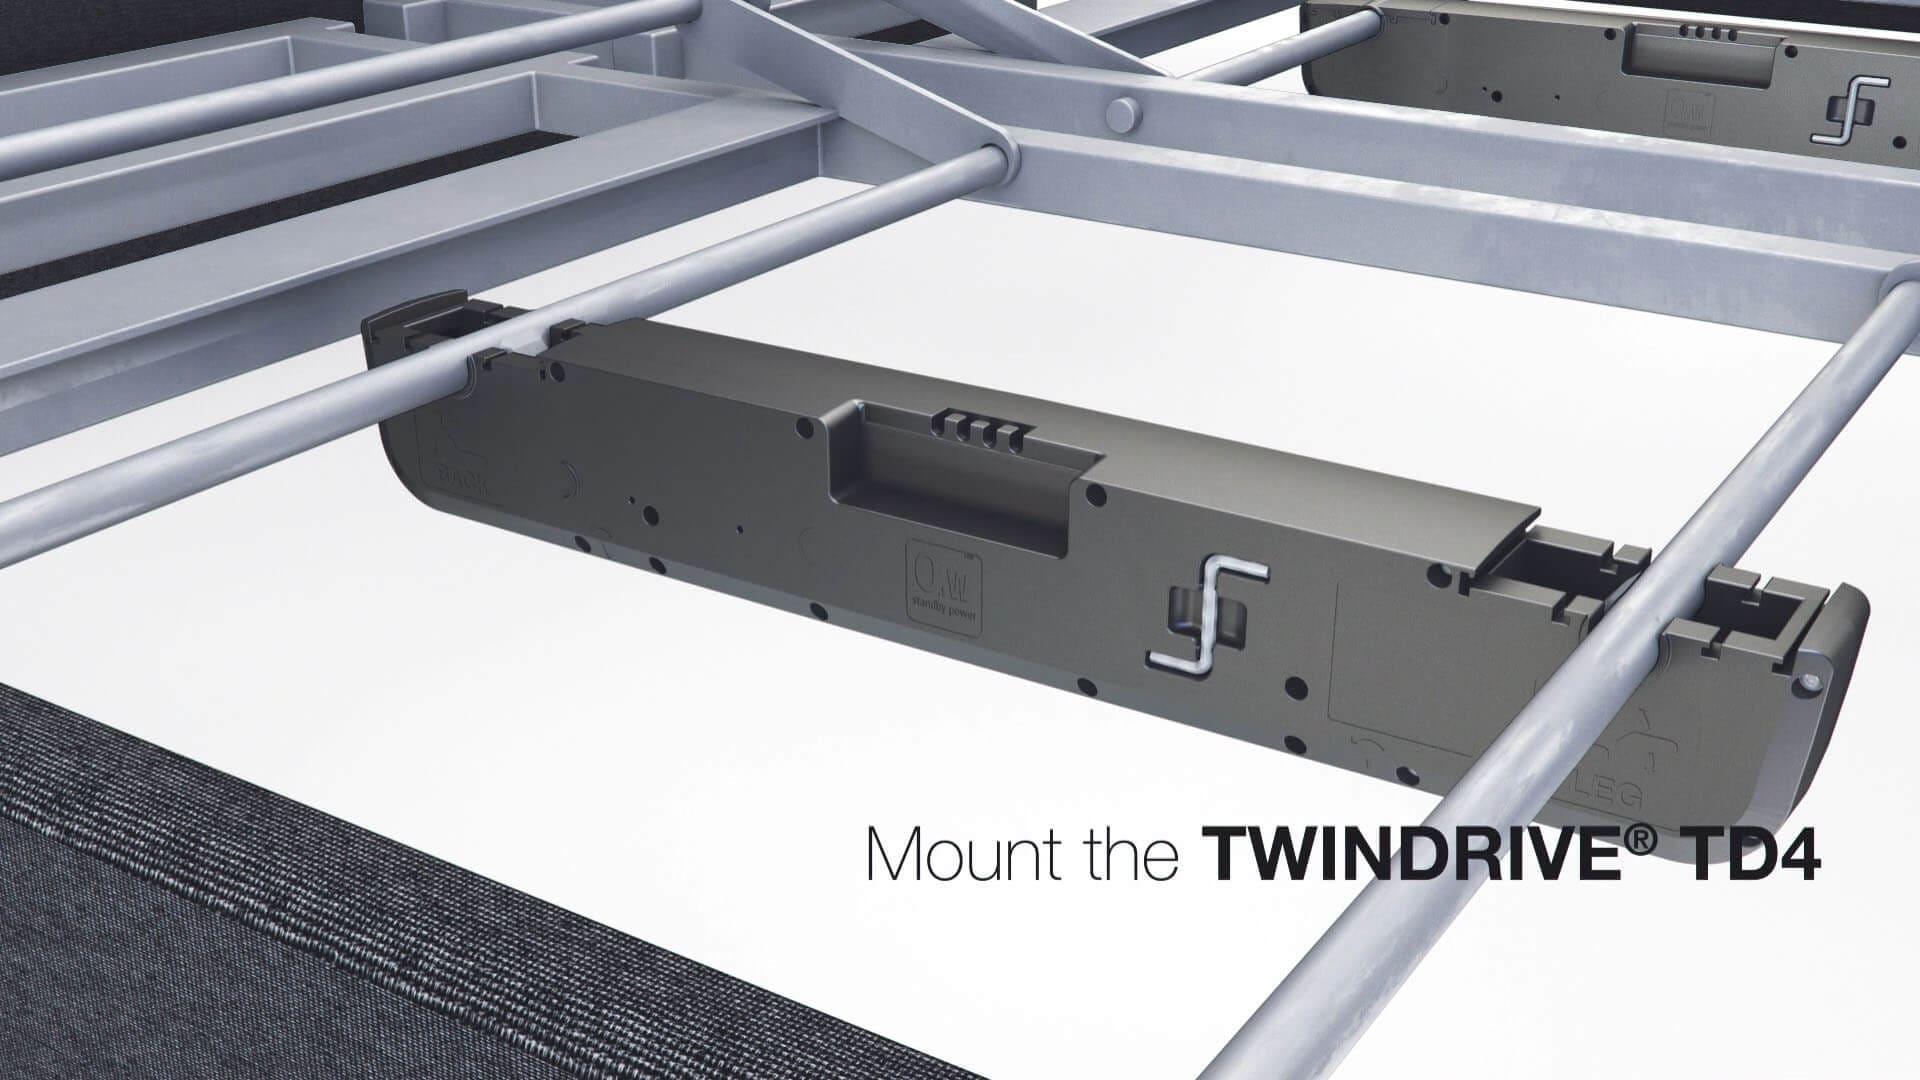 Montage du LINAK TWINDRIVE® TD4